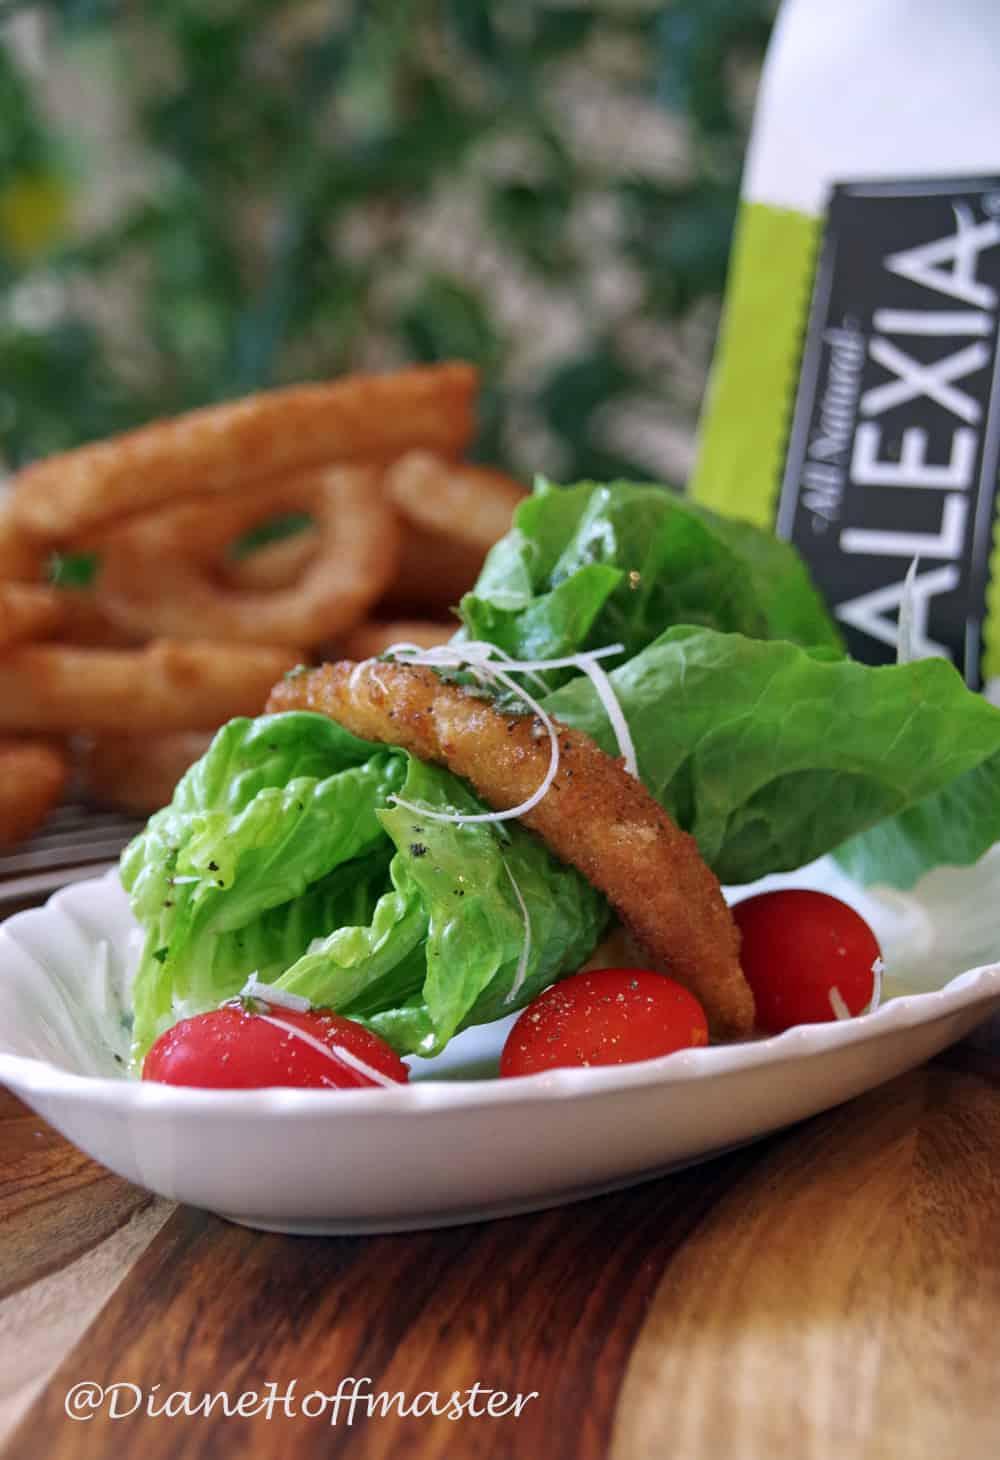 Onion Ring Salad Recipe andwith Lemon-Herb Vinaigrette #SpringIntoFlavor #CollectiveBias